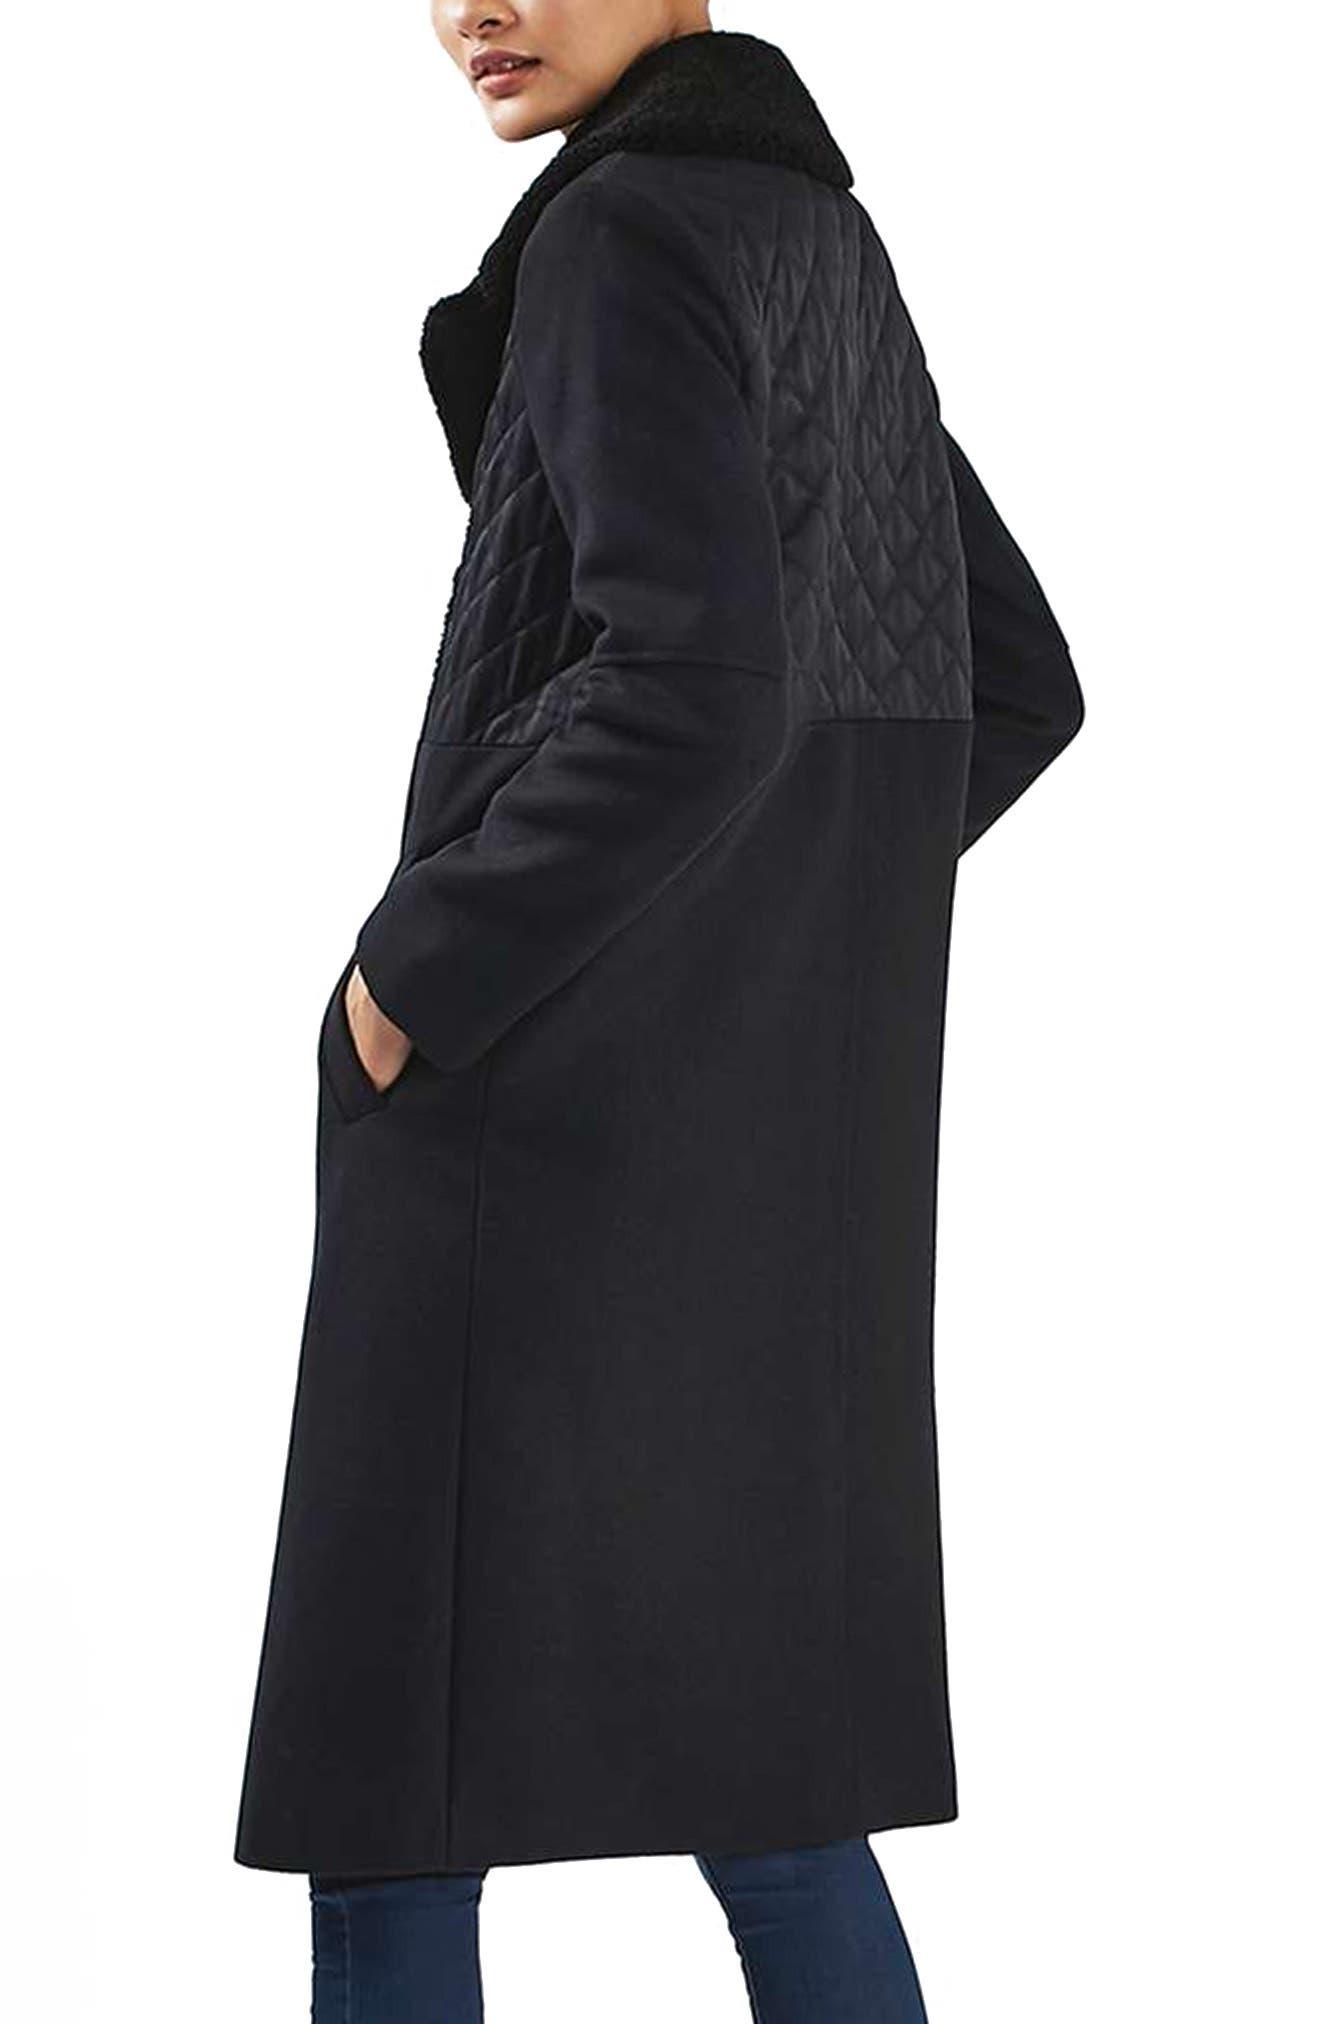 TOPSHOP, Faux Shearling Collar Coat, Alternate thumbnail 2, color, 410